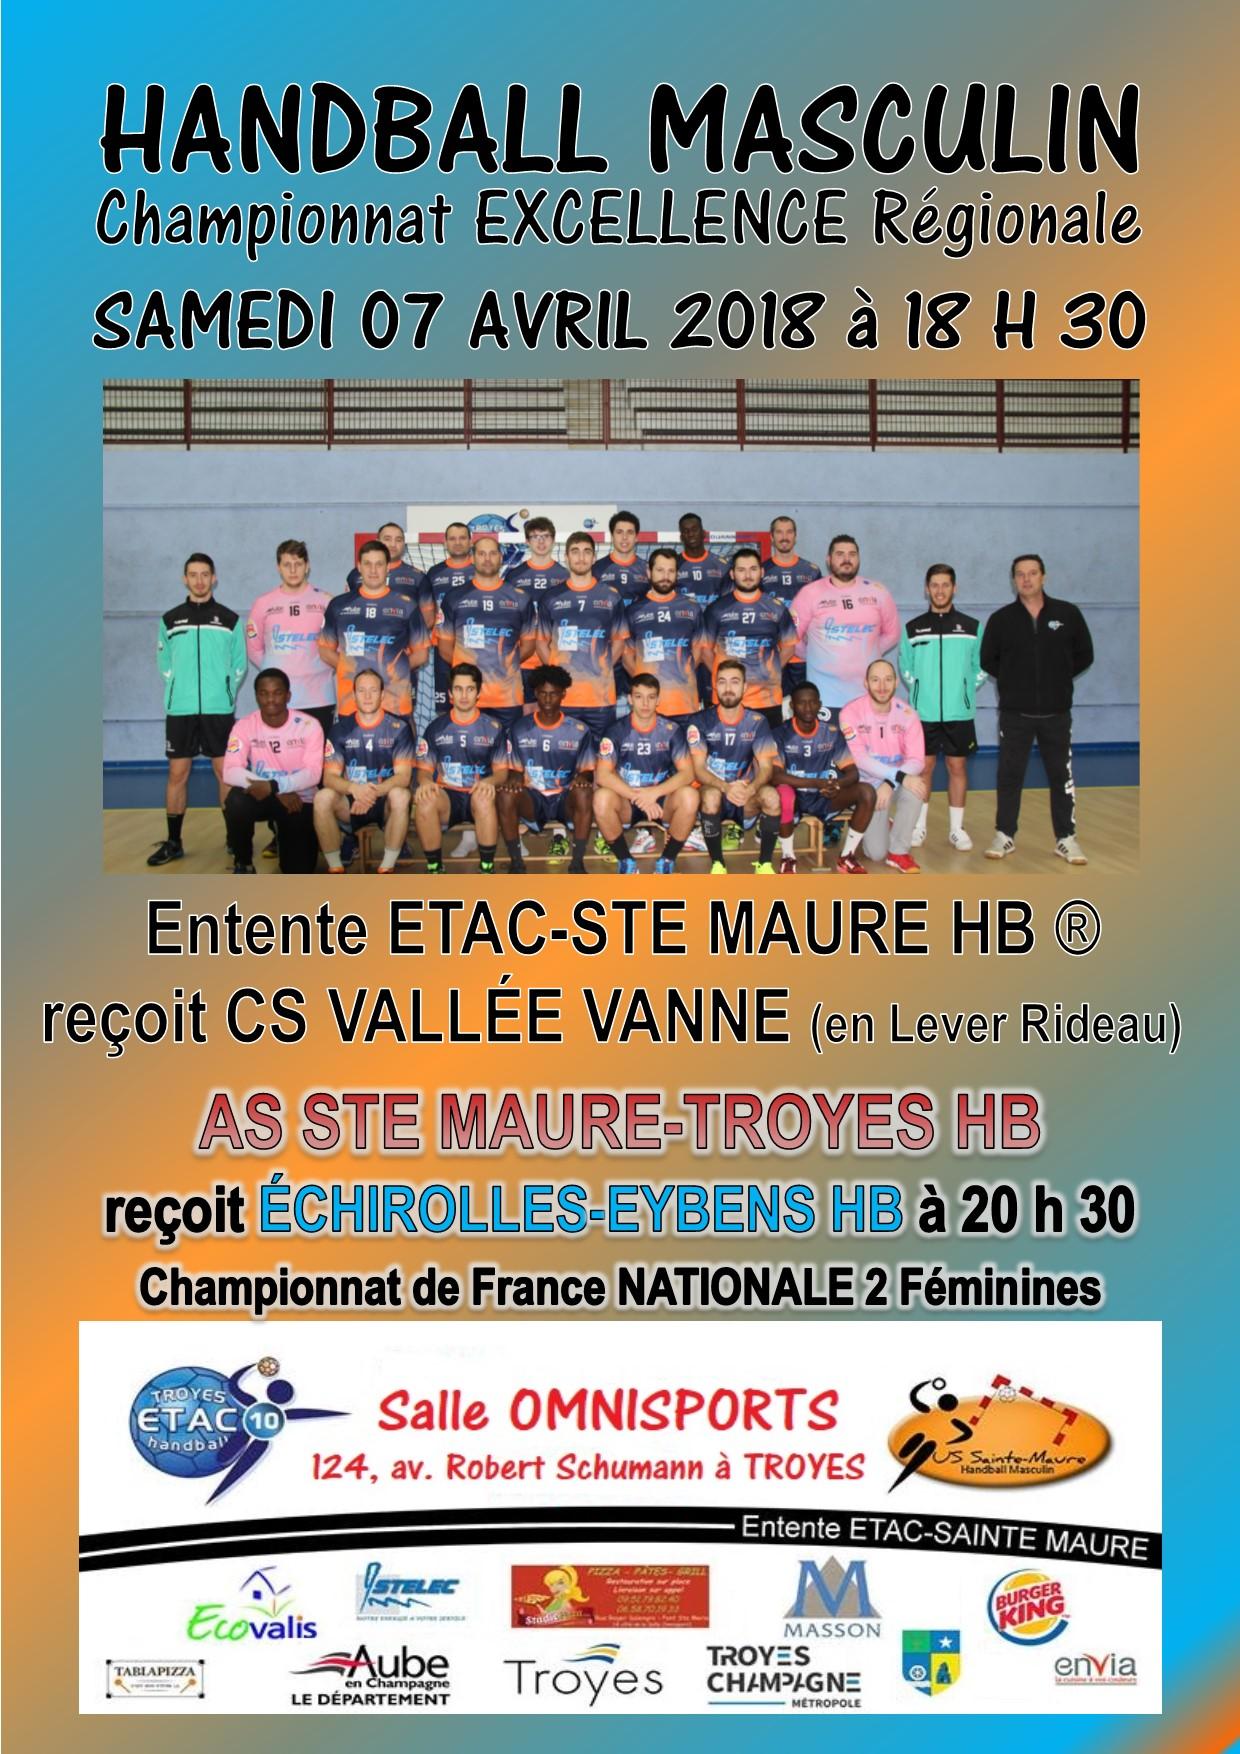 Samedi 07 avril - Salle Omnisports